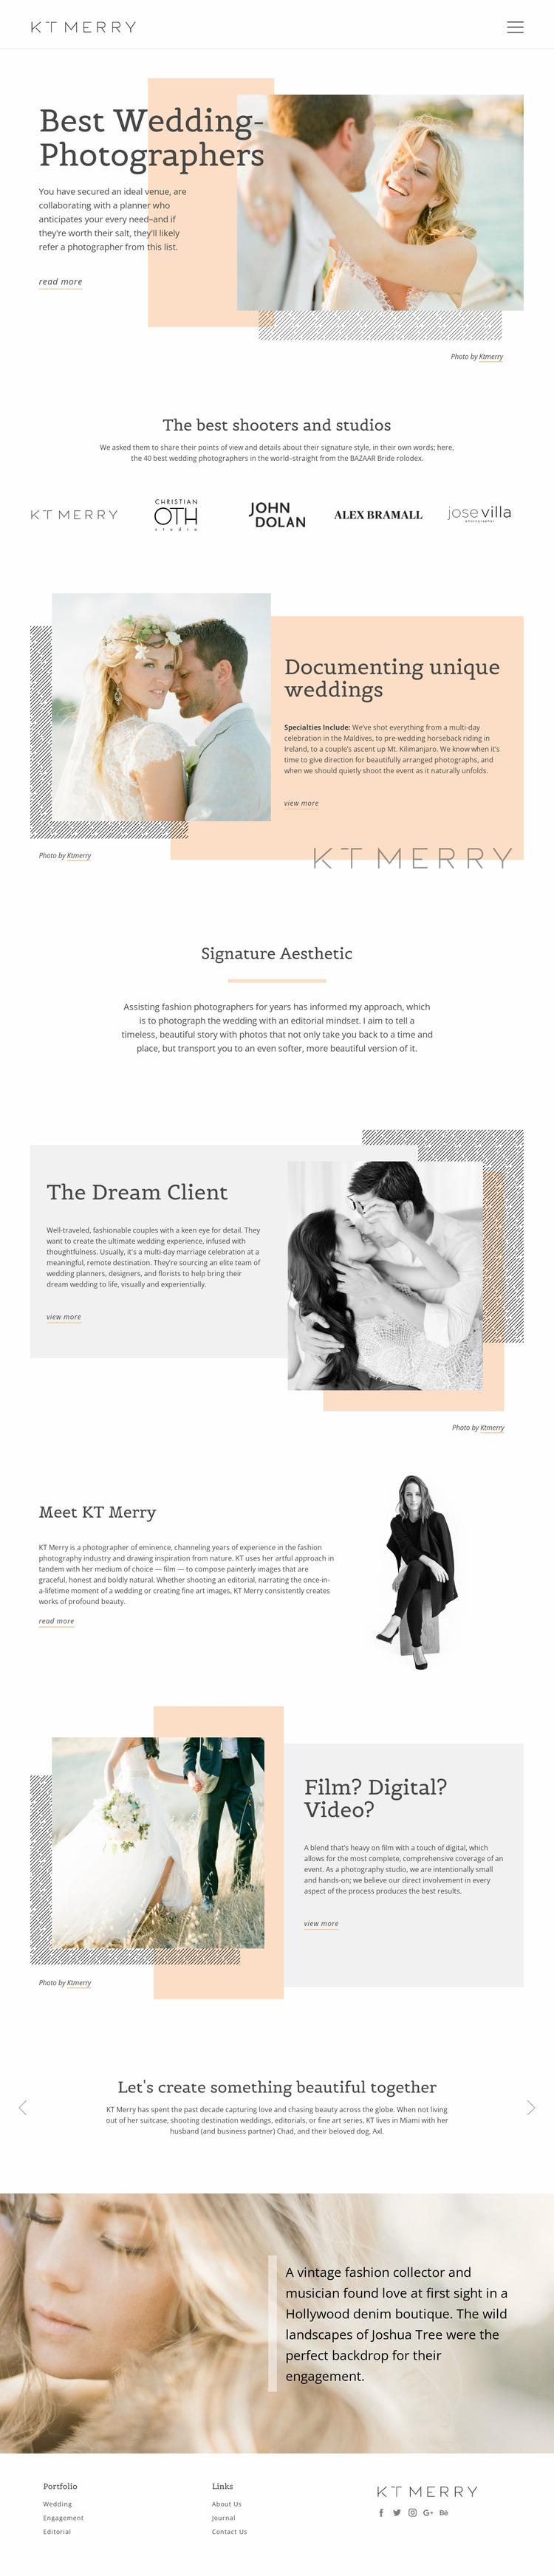 Wedding Photographers Website Mockup